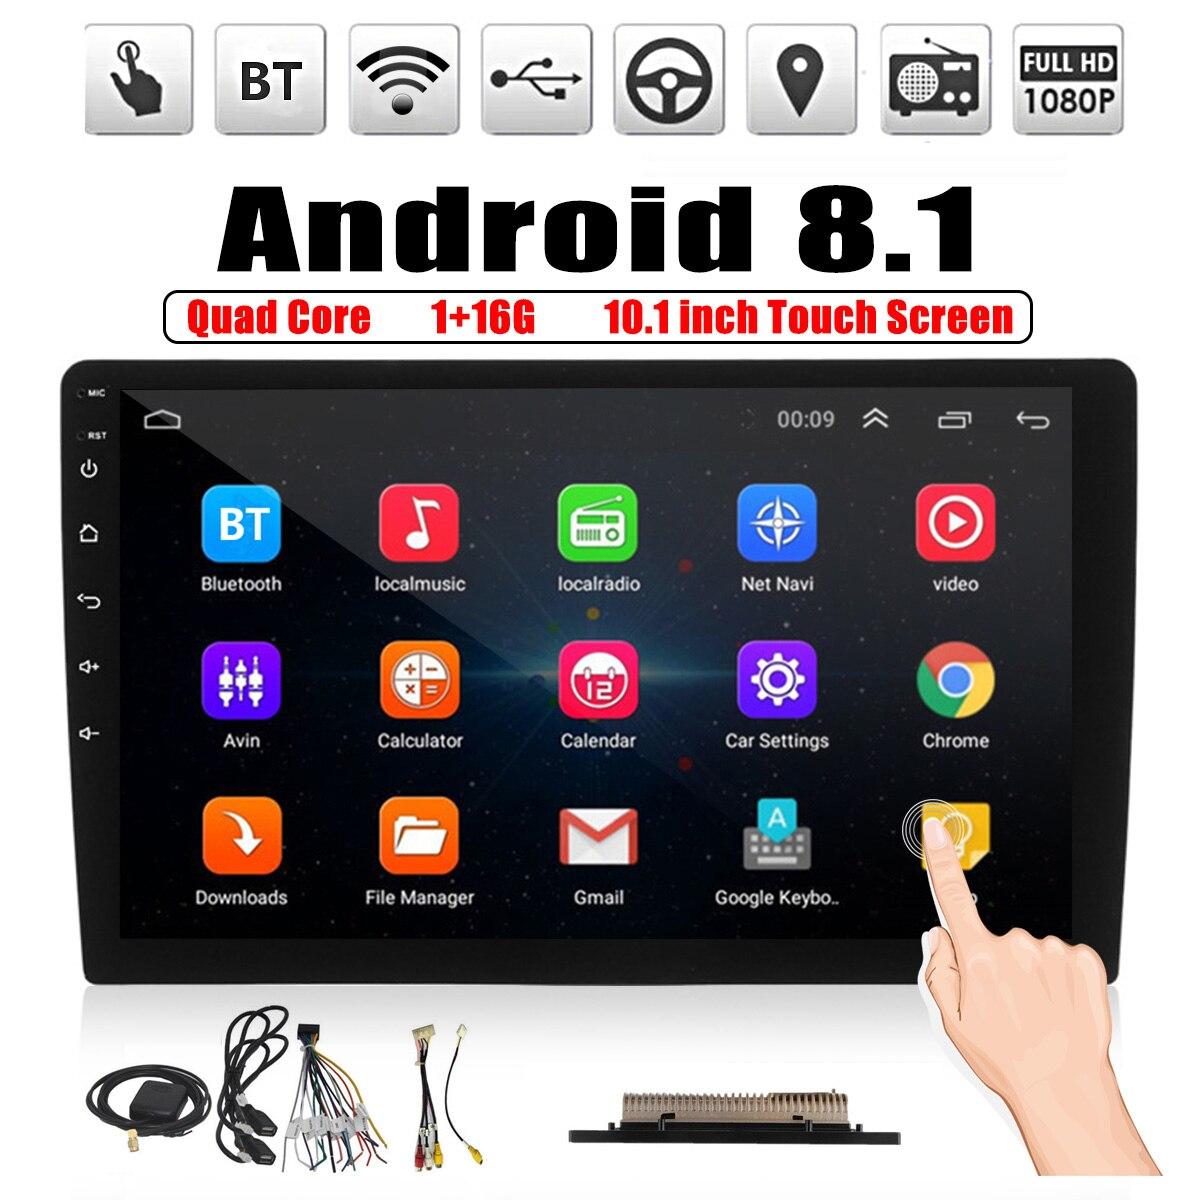 Lecteur multimédia de voiture 10.1 ''Android 8.1 autoradio 2DIN bluetooth WIFI GPS Nav Quad Core Radio vidéo lecteur MP5